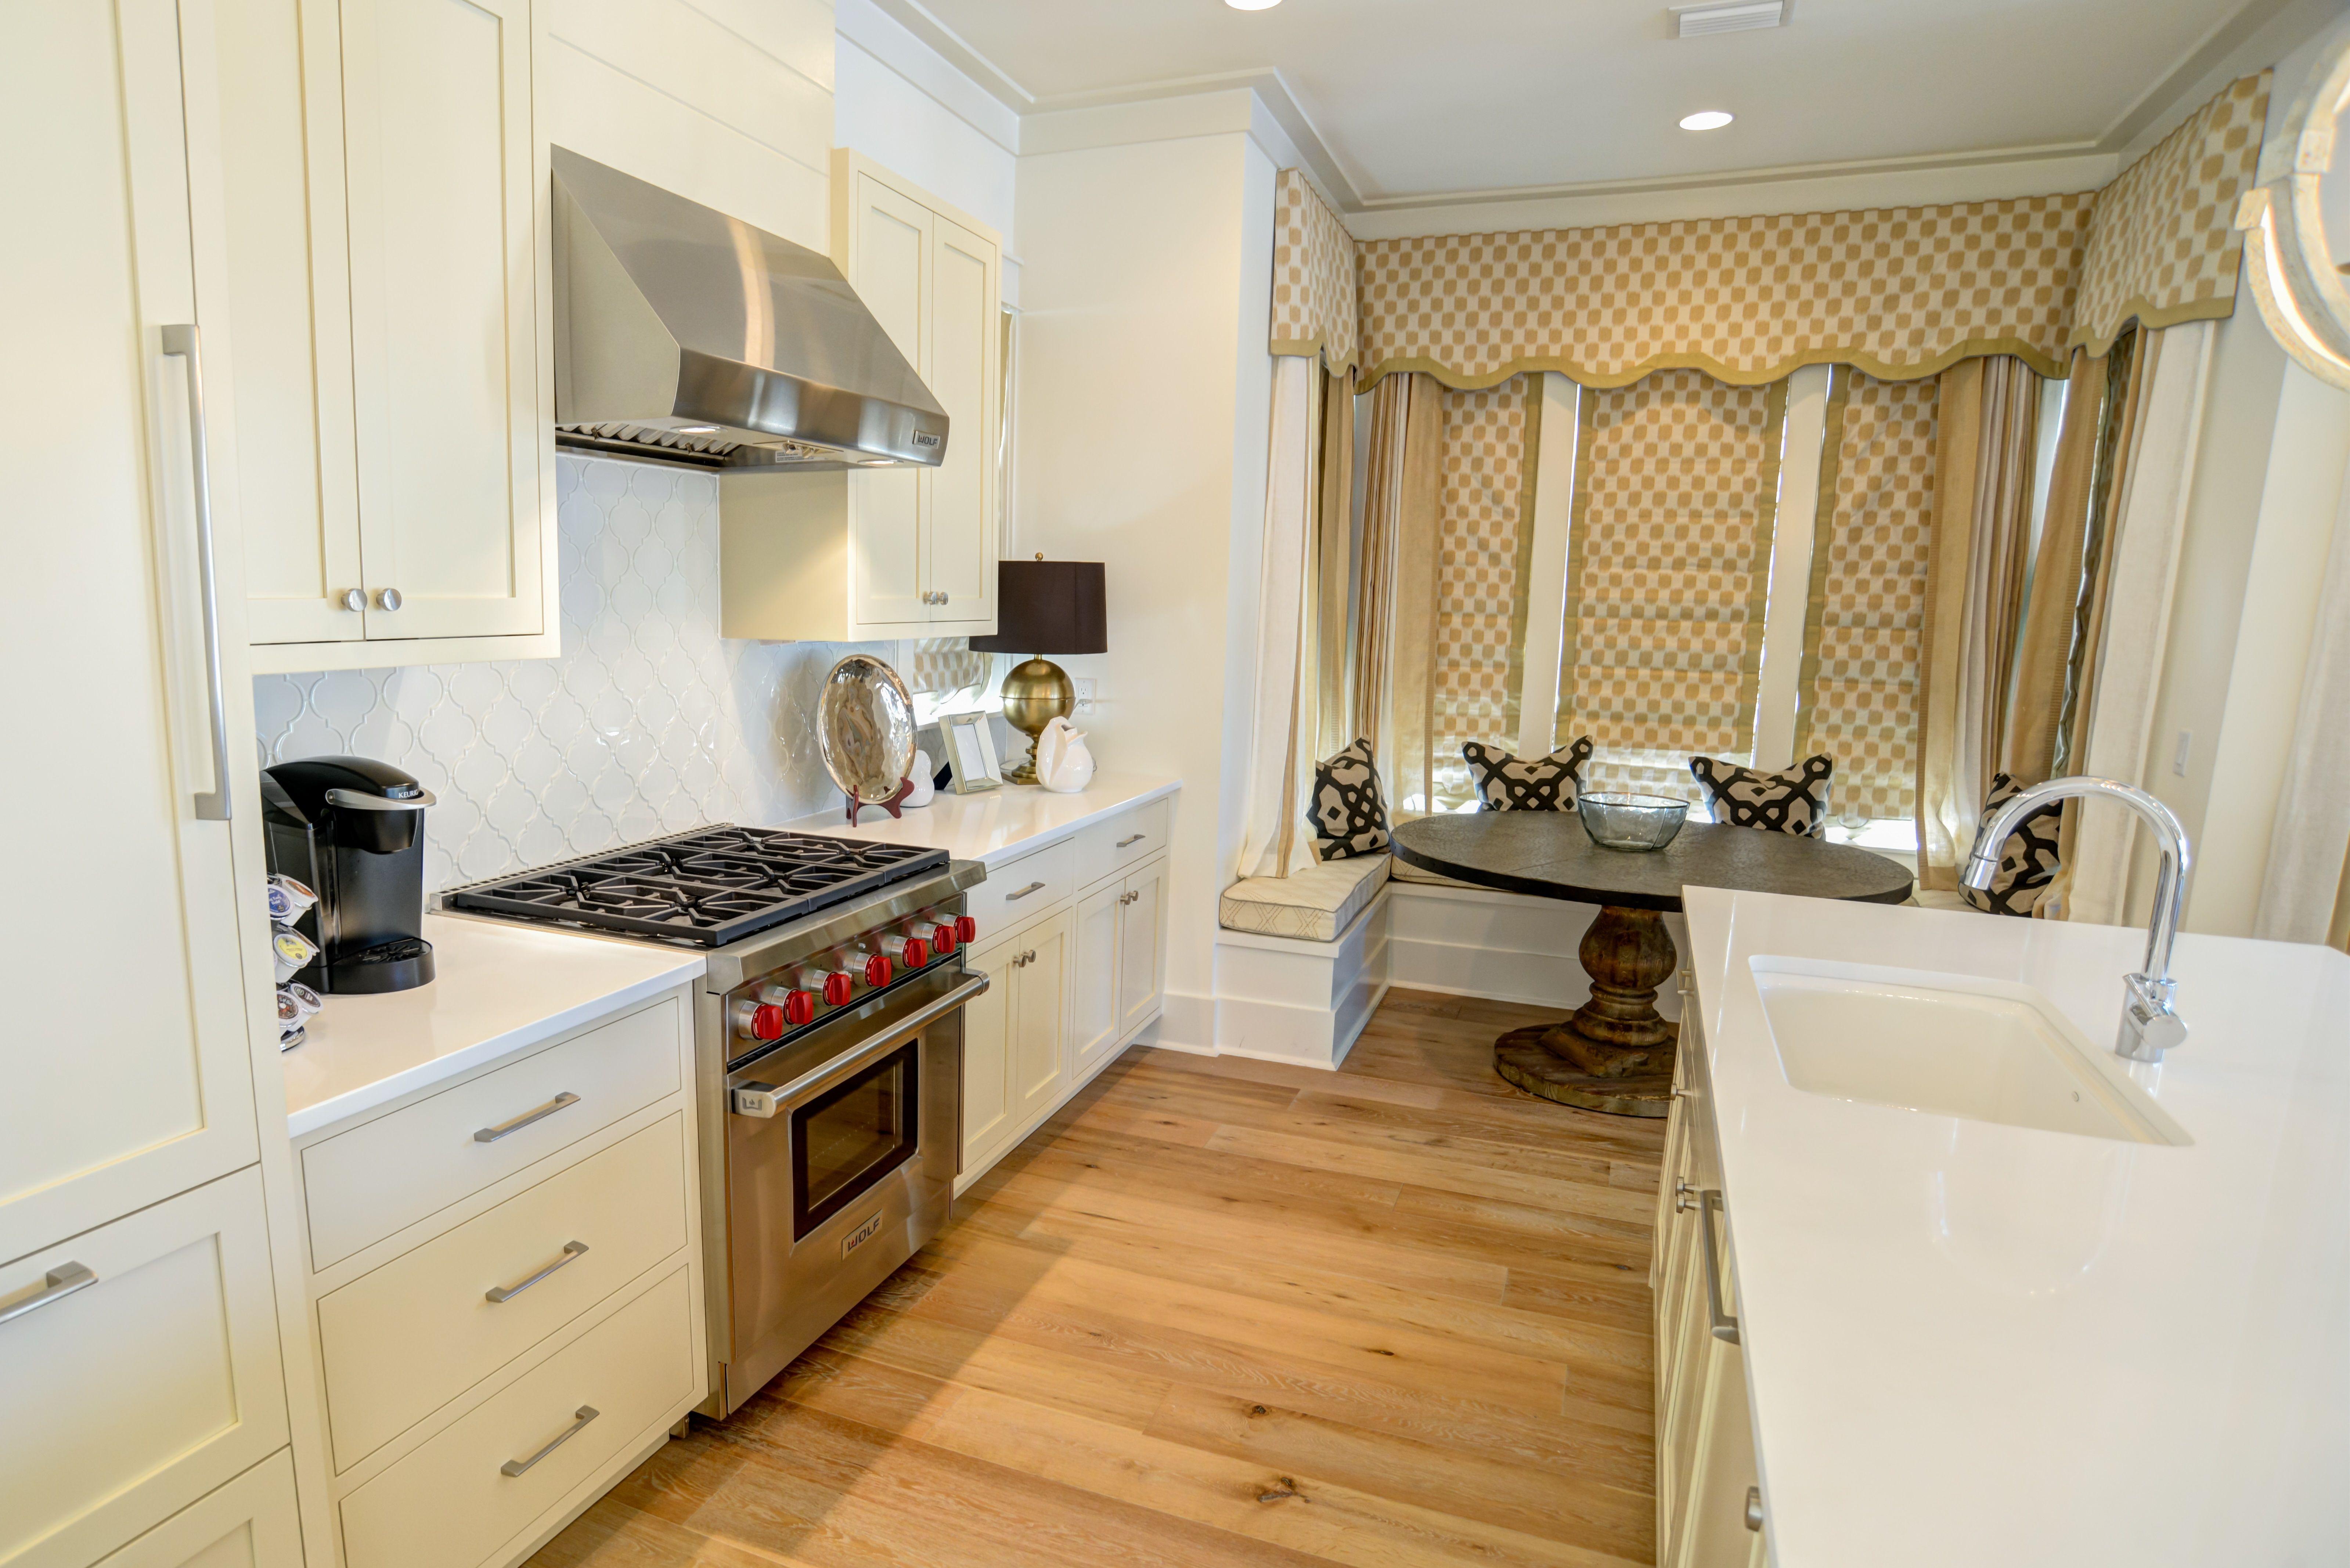 Weatherly Kitchen | Model Home